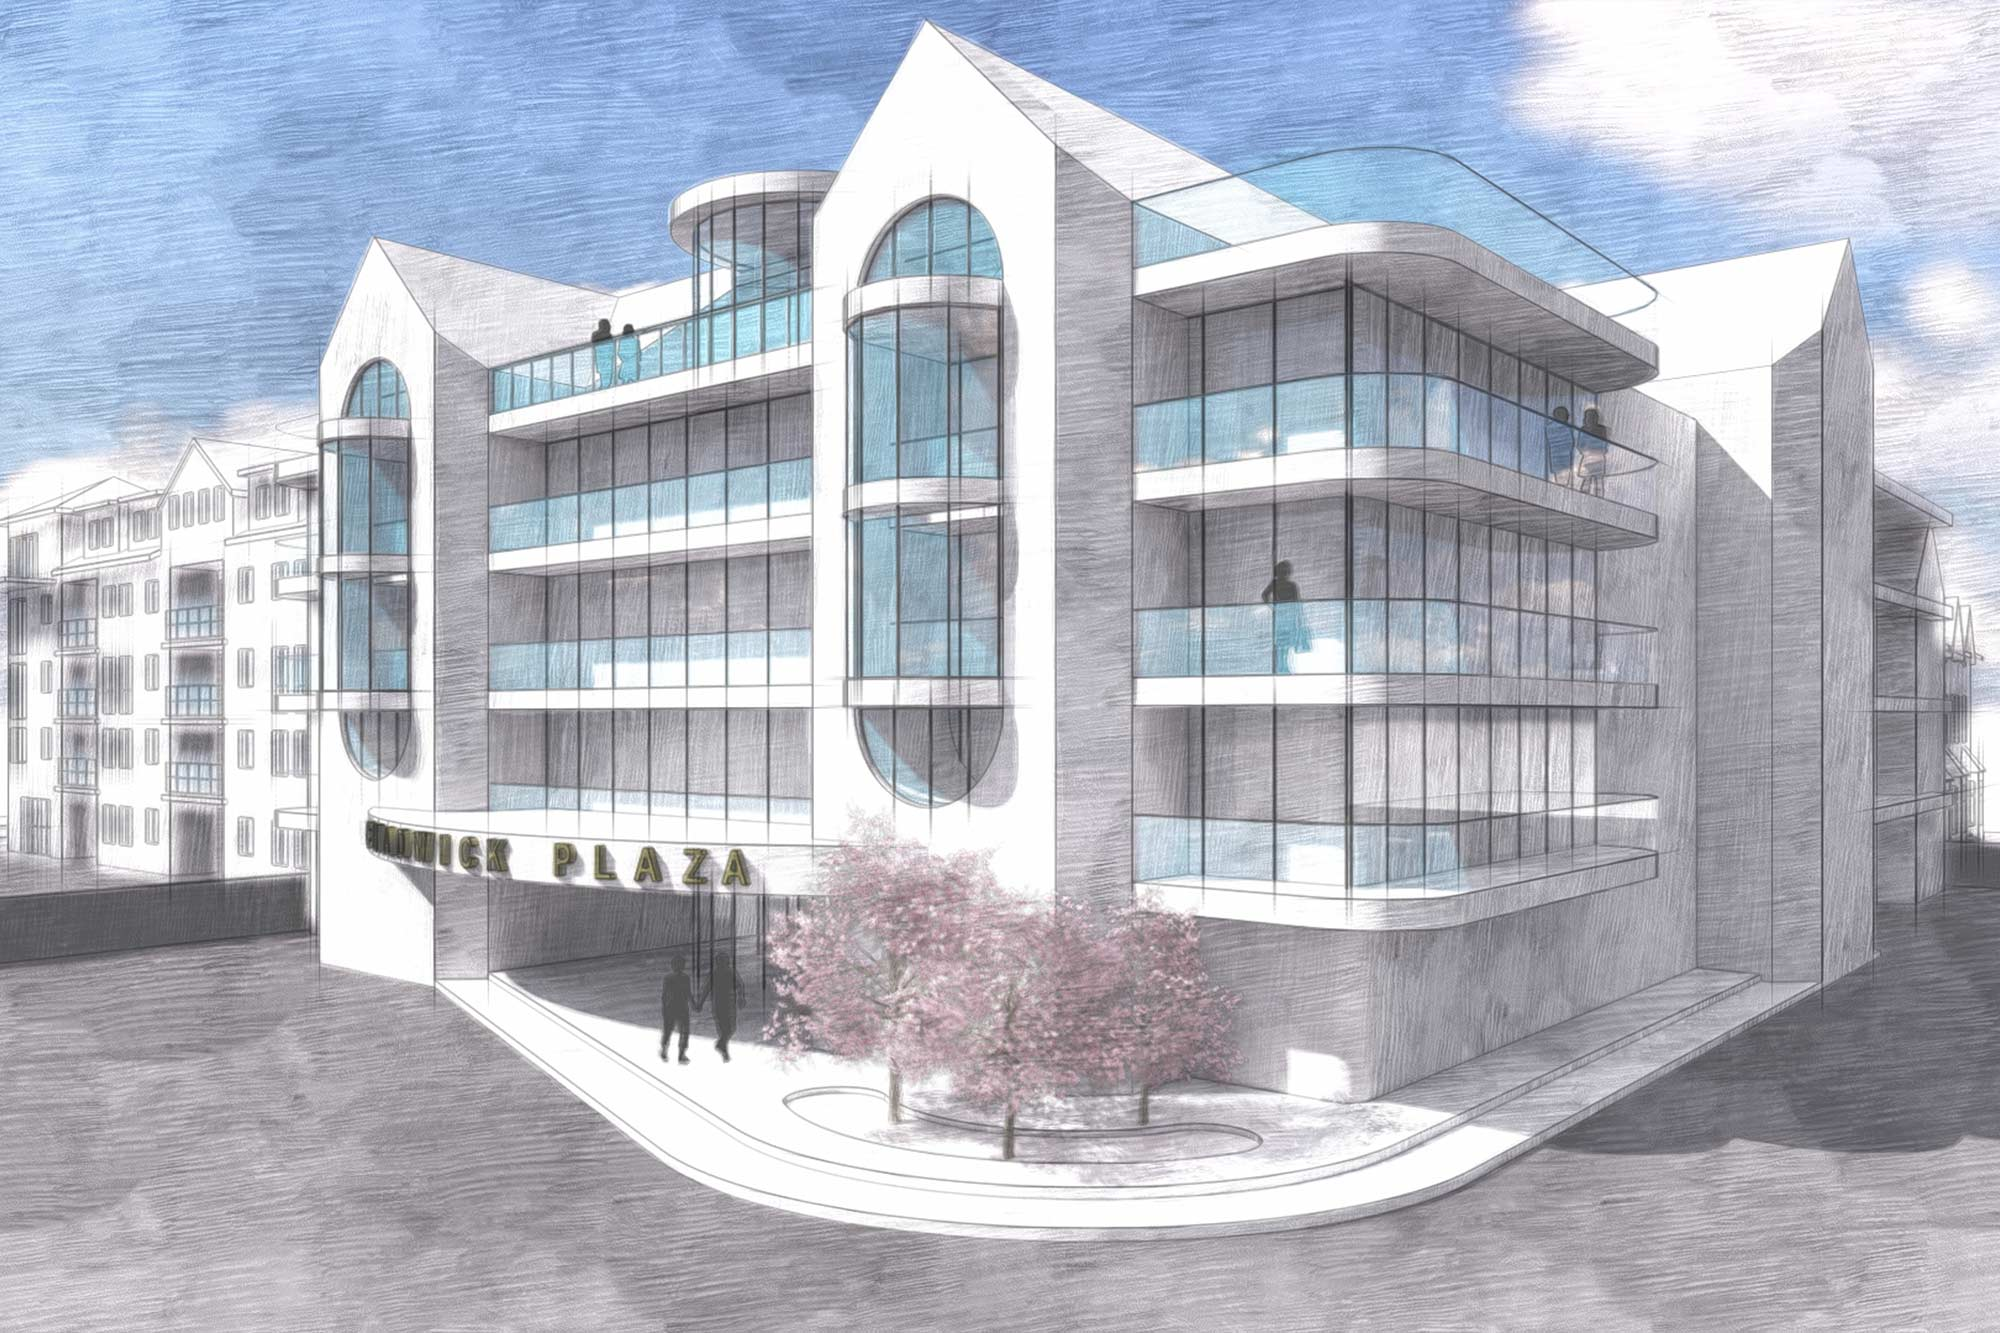 Art Deco Seaside, beachfront apartment block architectural design in Lytham St Annes